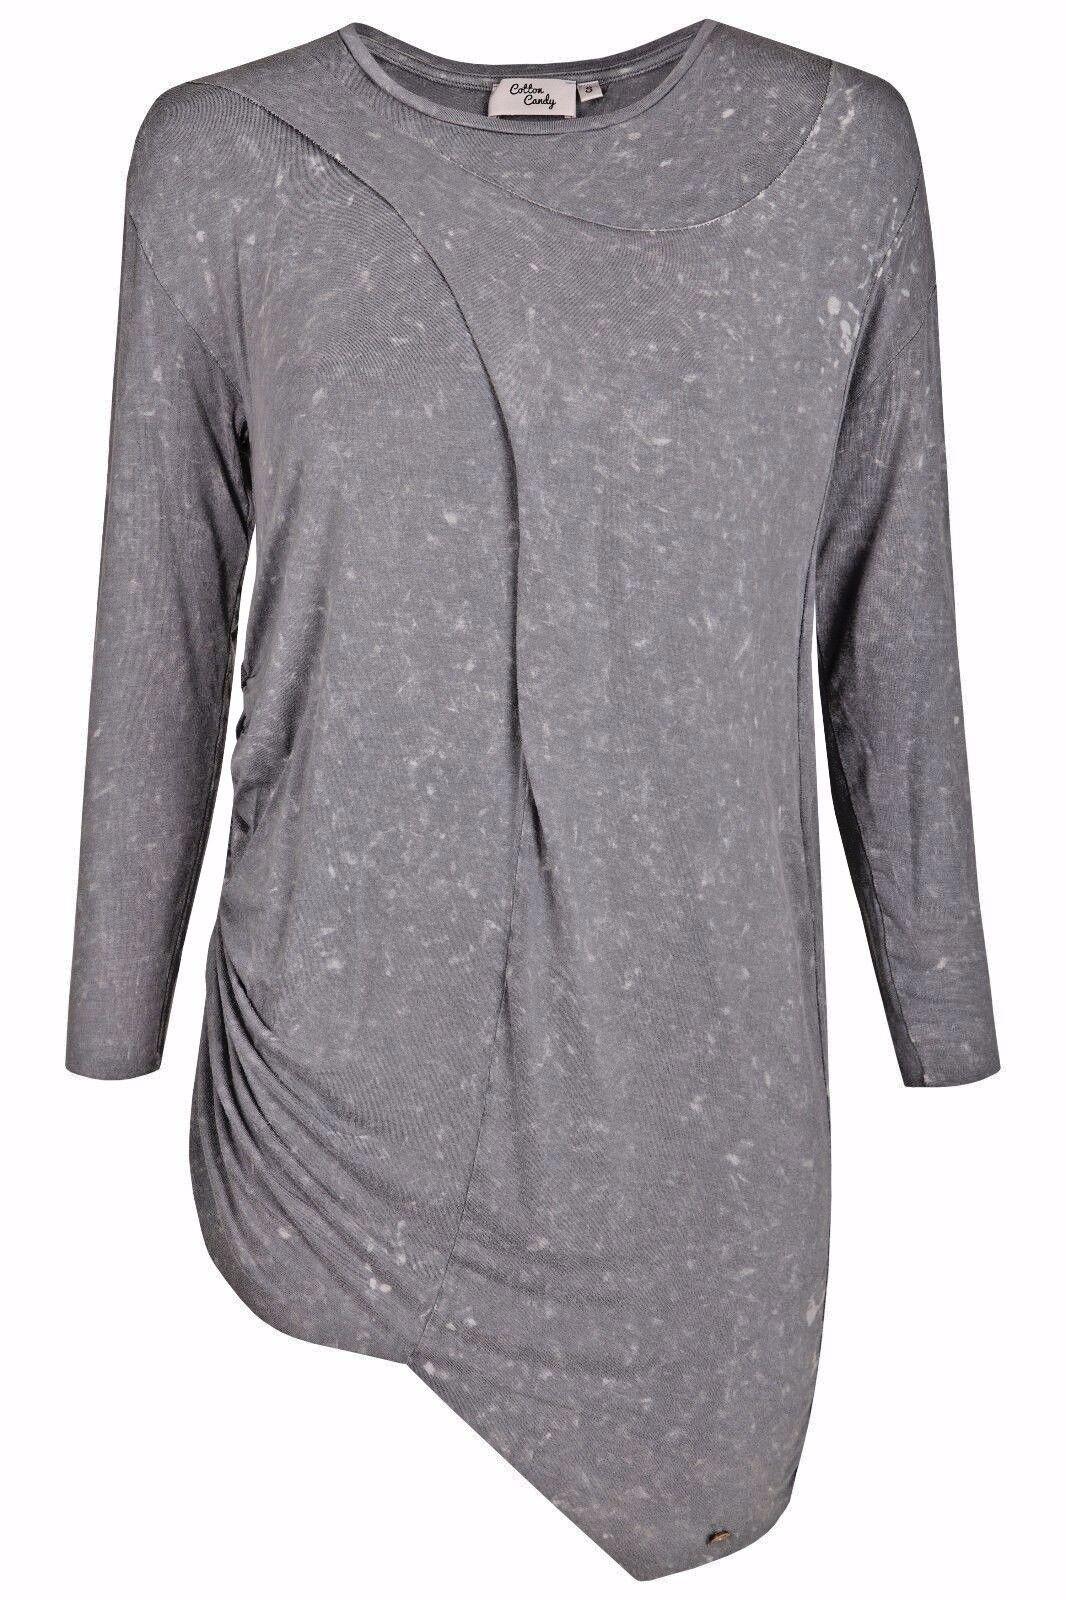 Cotton Candy Damen Langarm Shirt grau asymetrisch